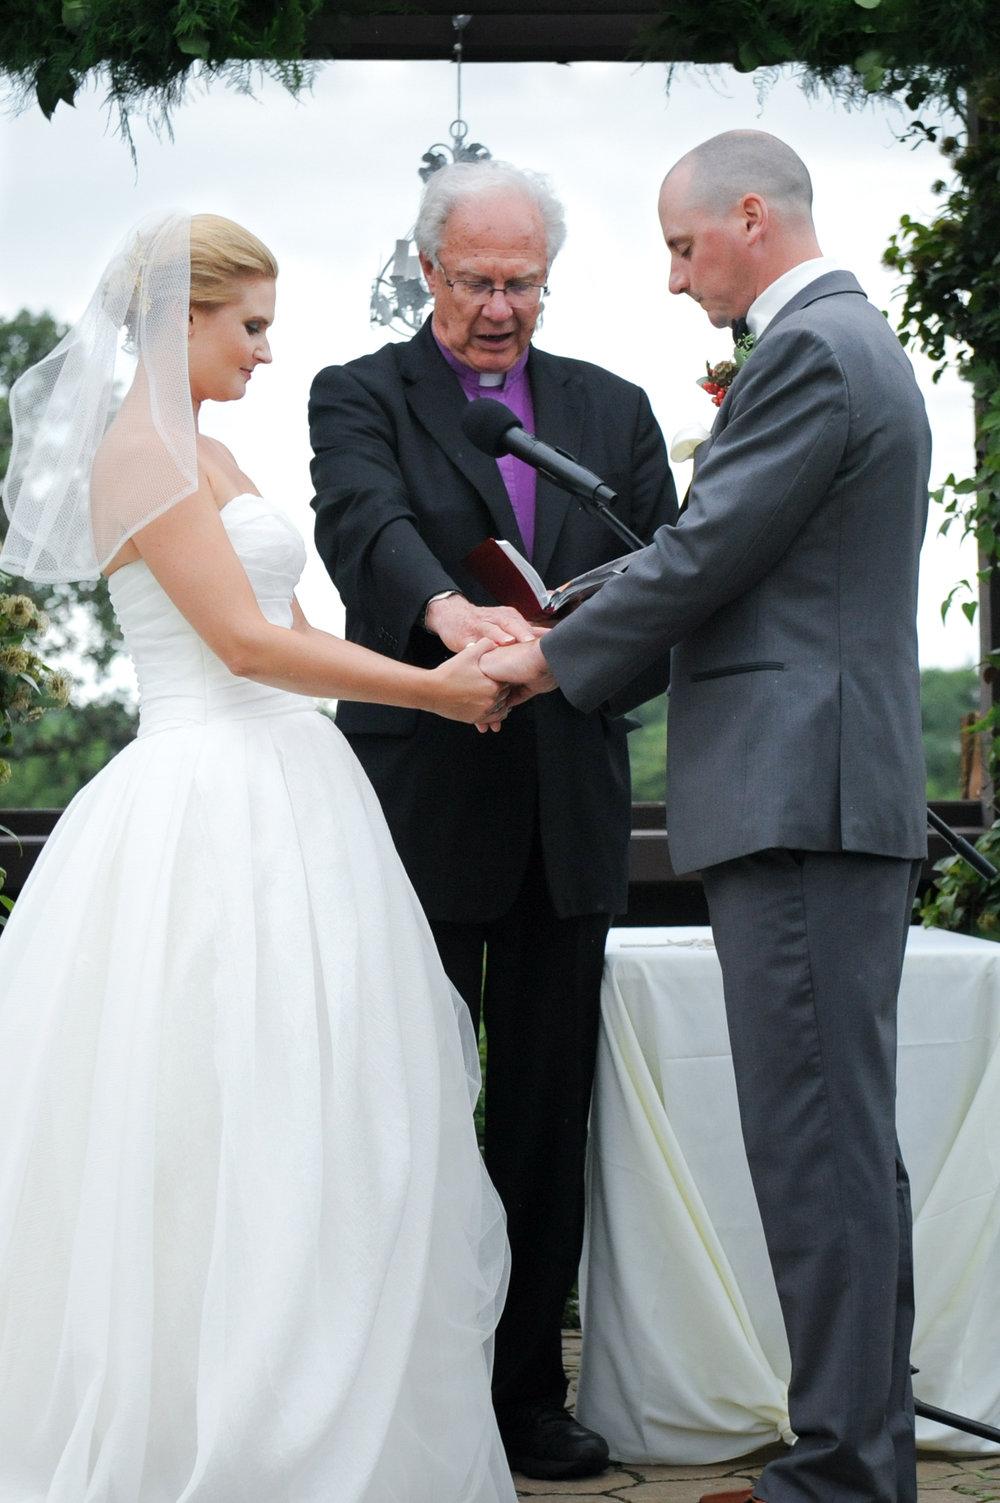 Paupore Wedding _16-7217-2.jpg